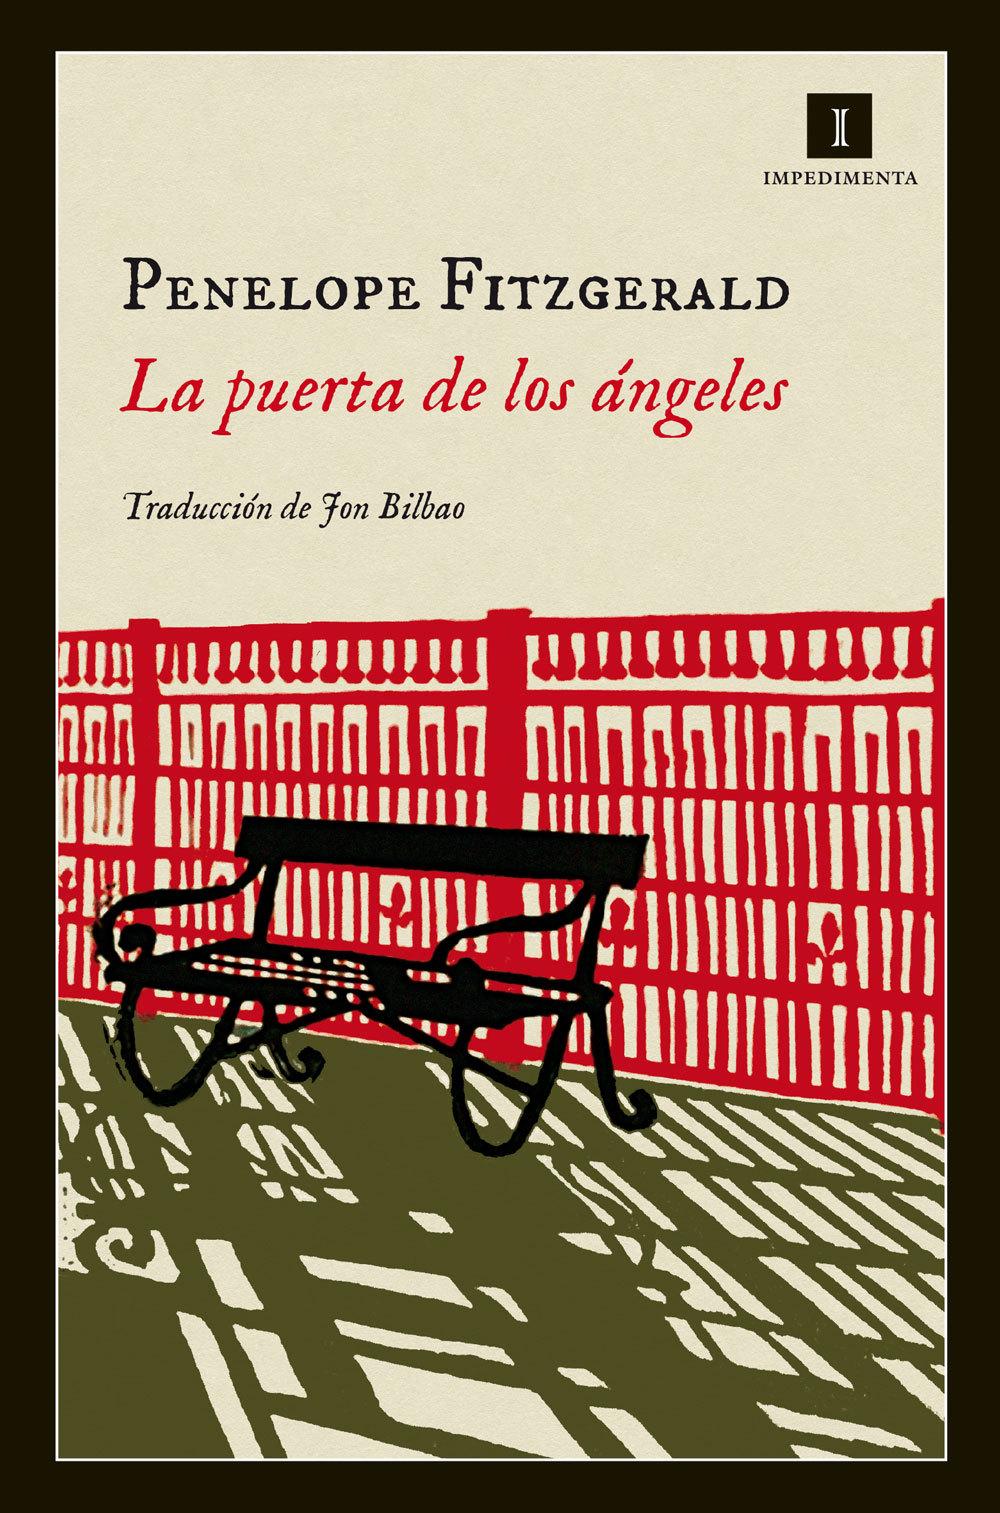 La puerta de los ángeles Penelope Fitzgerald